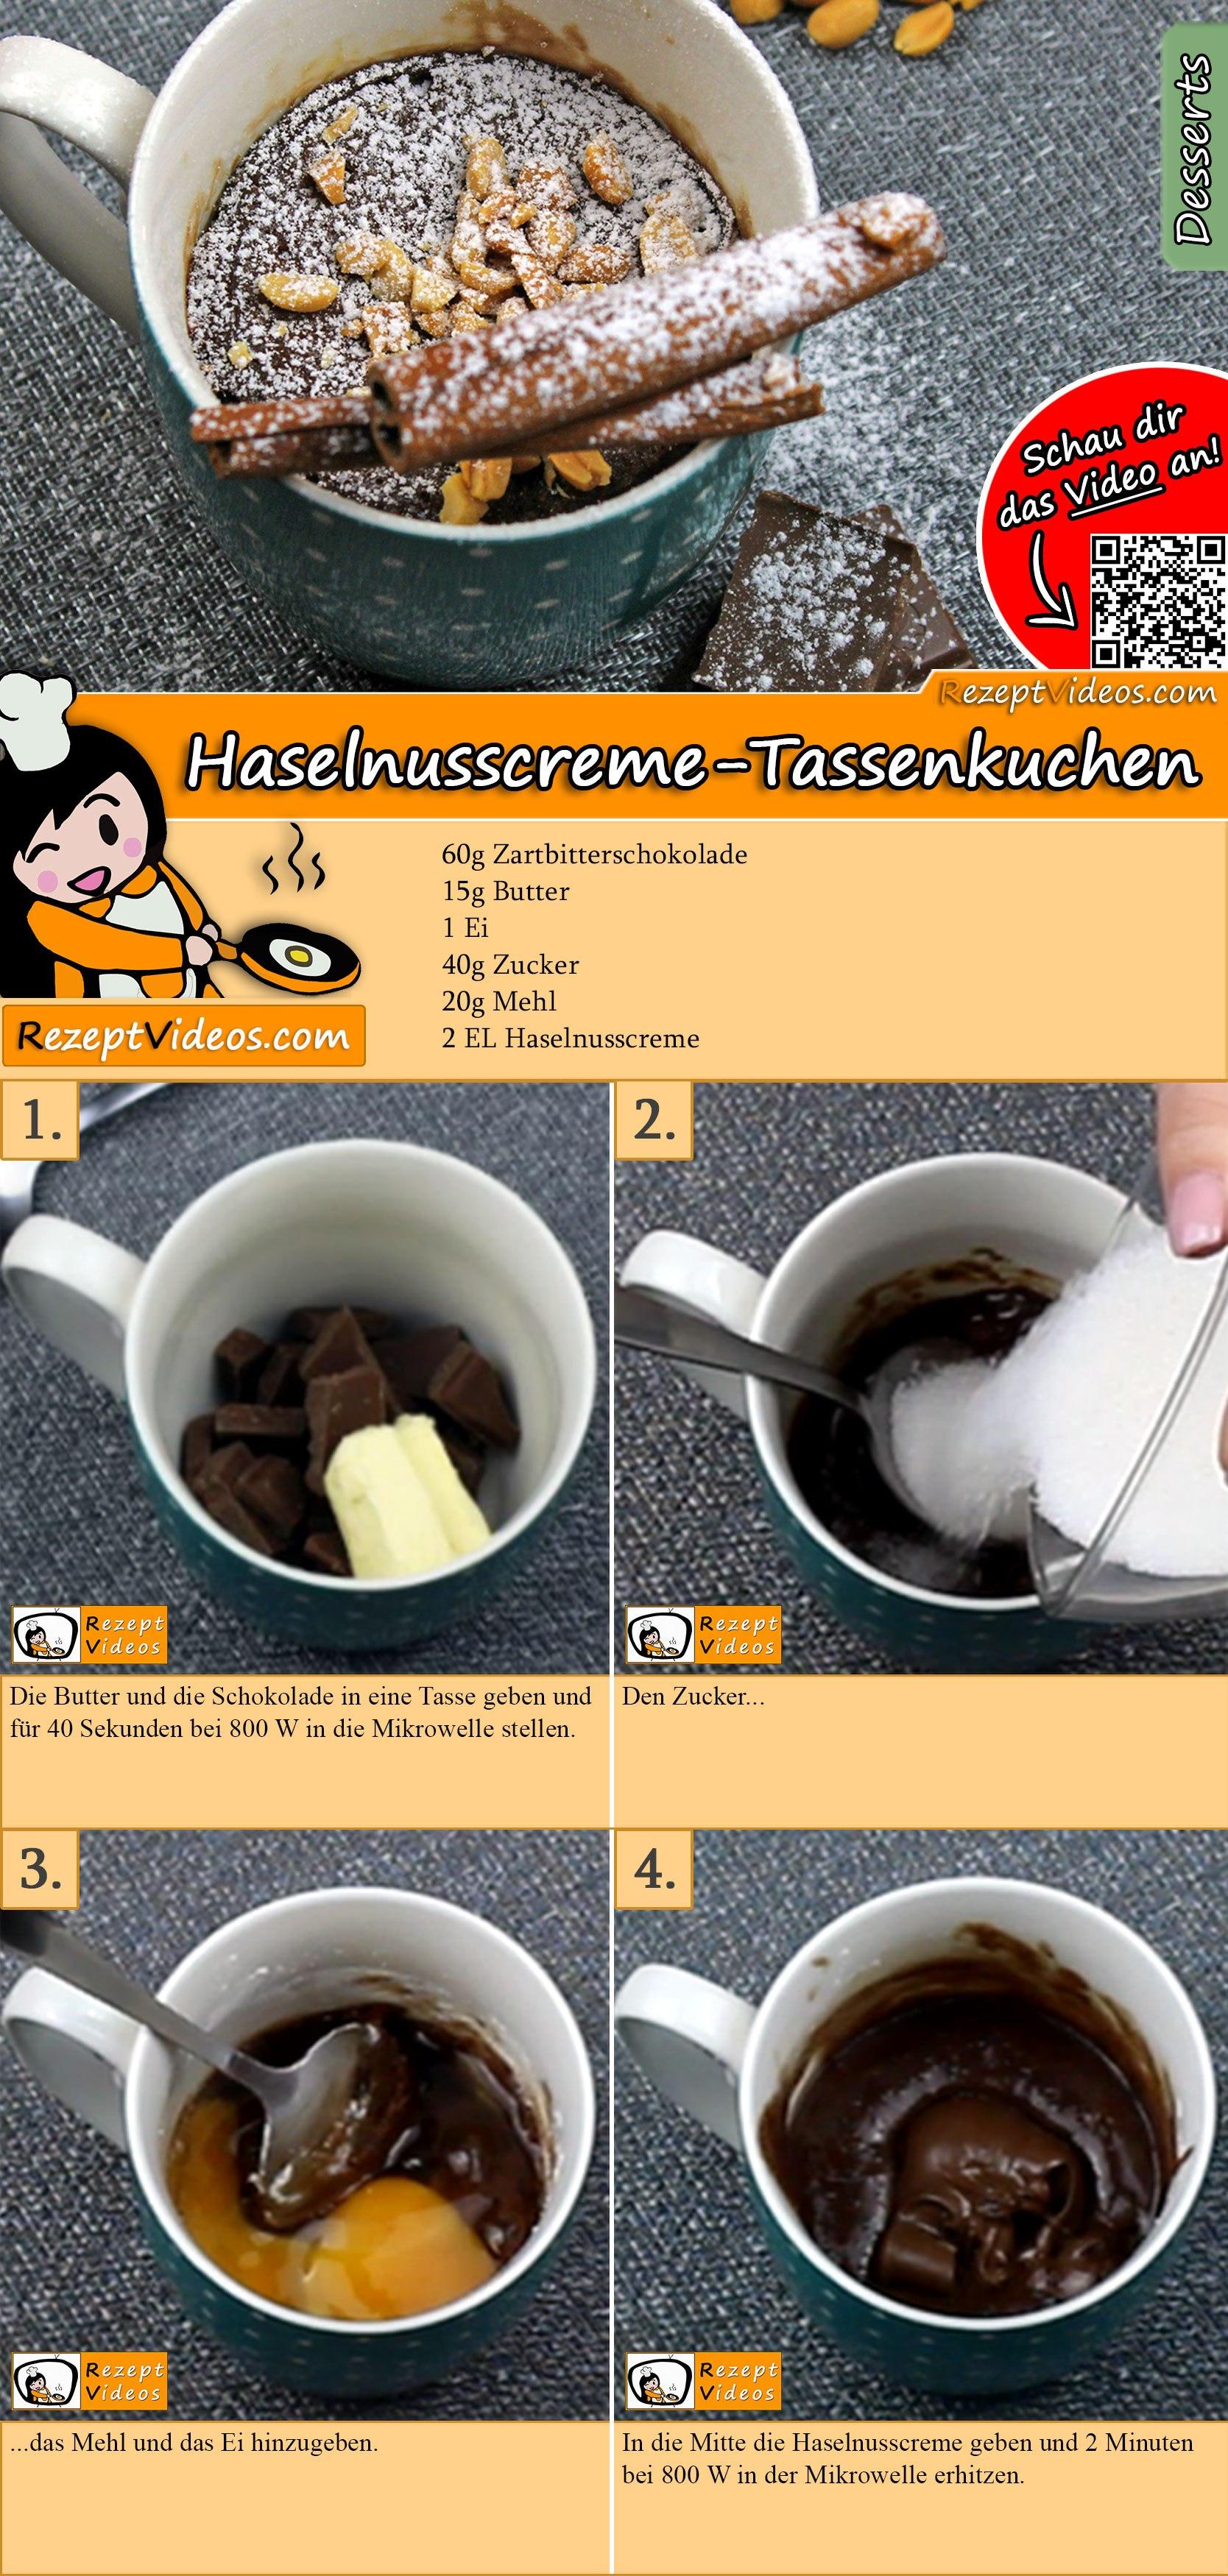 Haselnusscreme Tassenkuchen Rezept Mit Video Kuchenrezepte